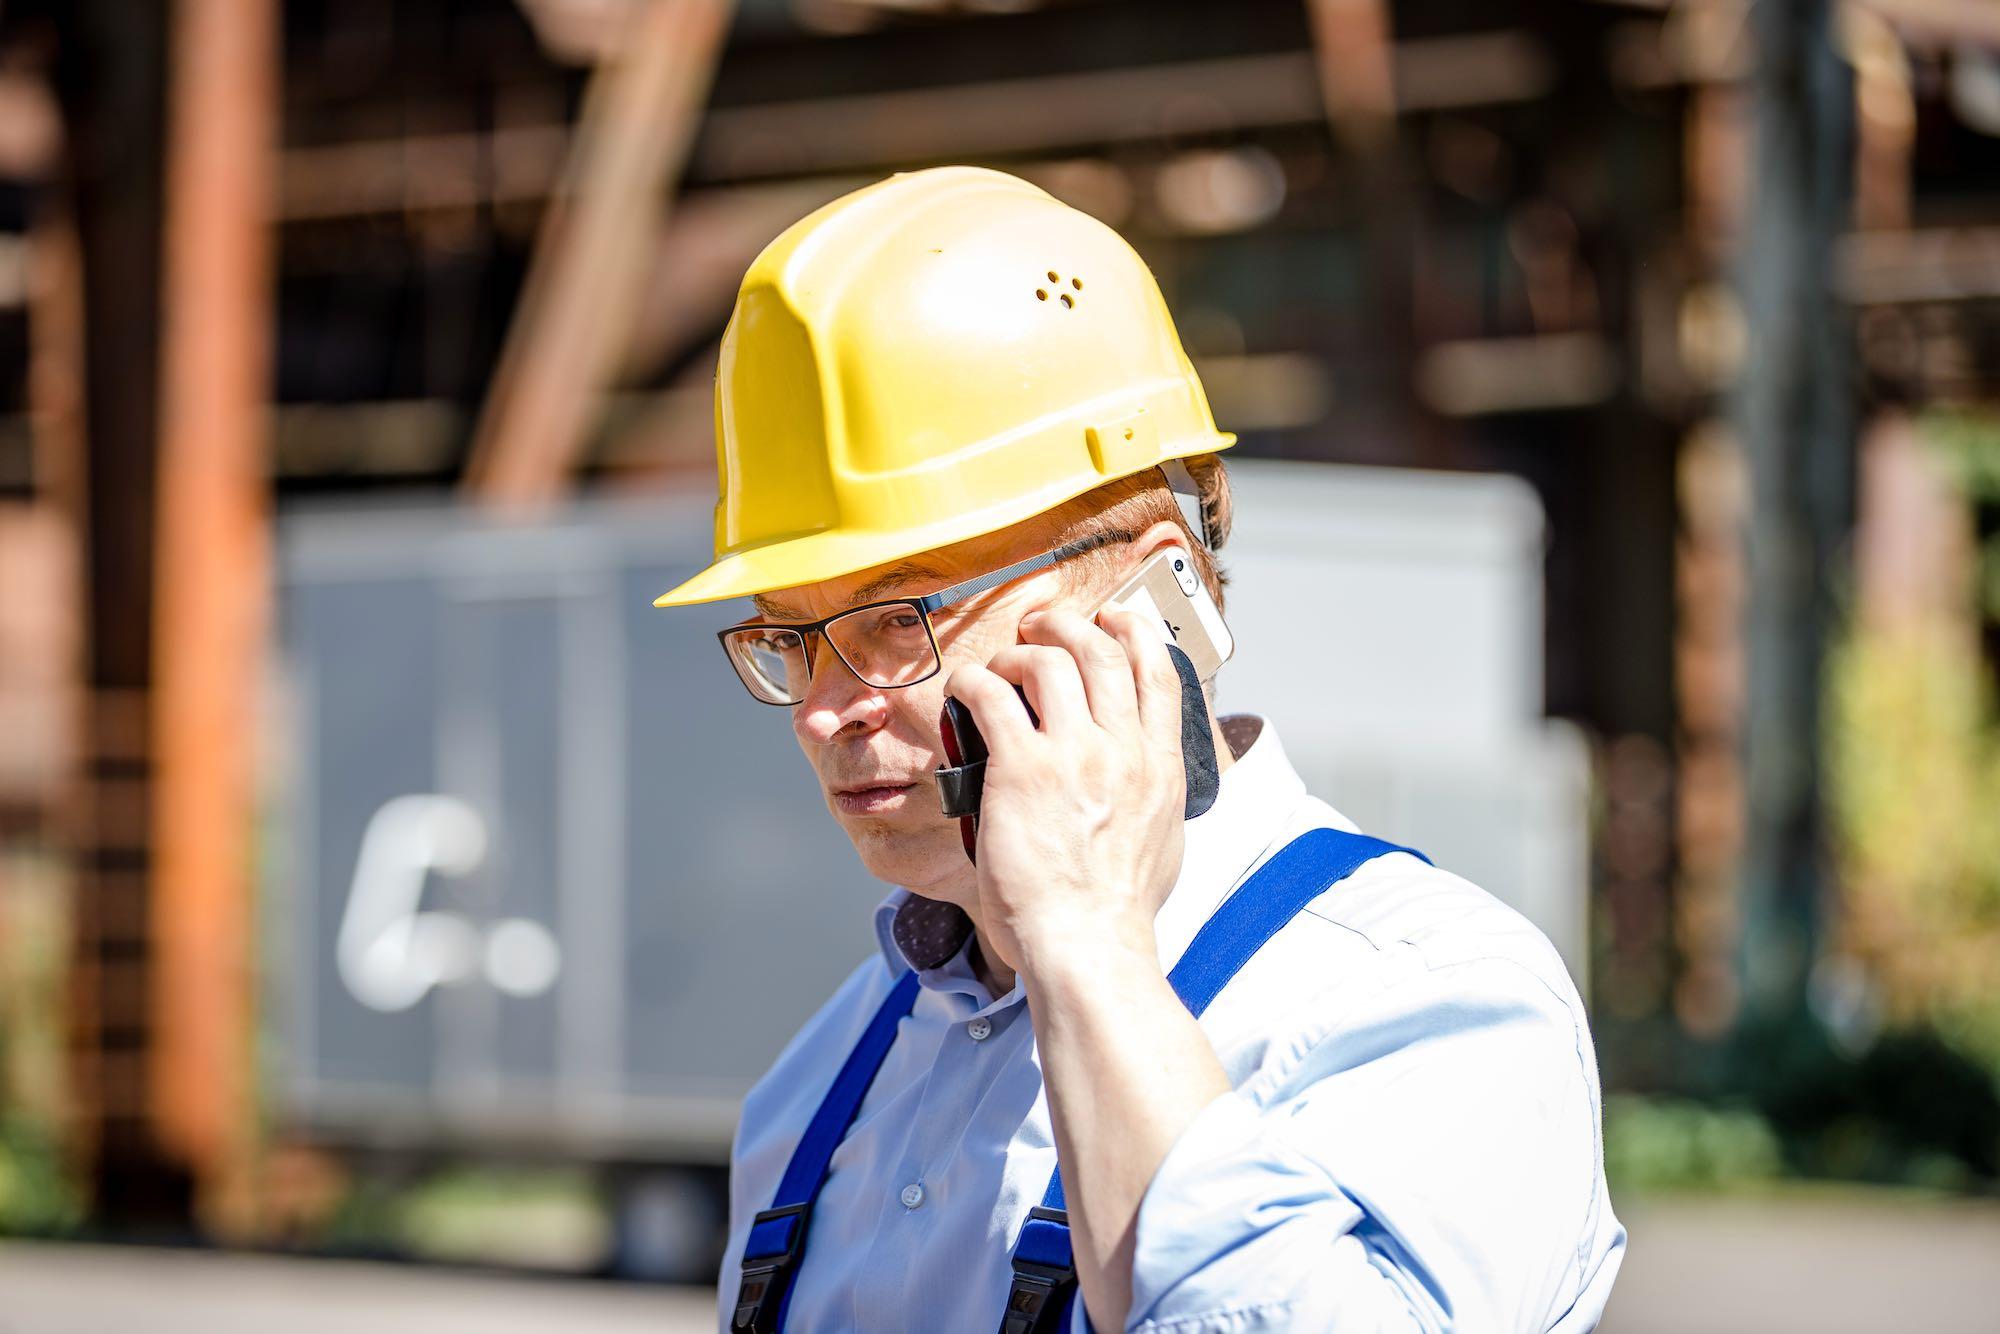 Wolfgang-Schmid-Stahlwerk-telefonieren-1